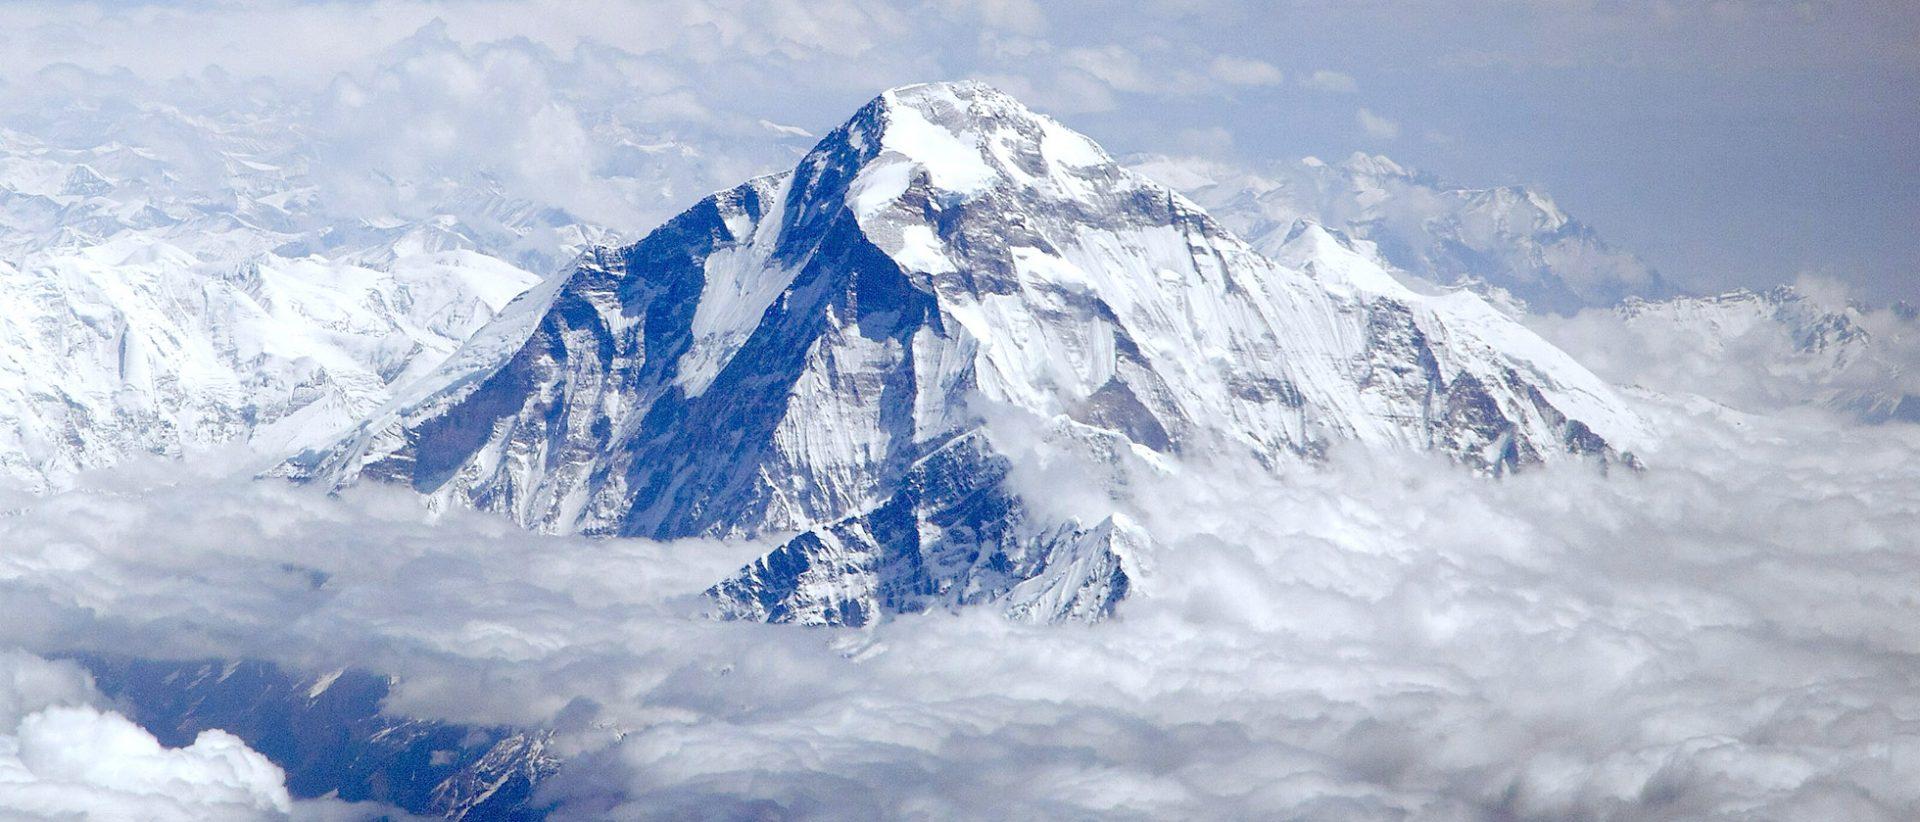 HIMALAYADVENTURE MMXXI – Dhaulágirí (8 167 m) Popis / Description